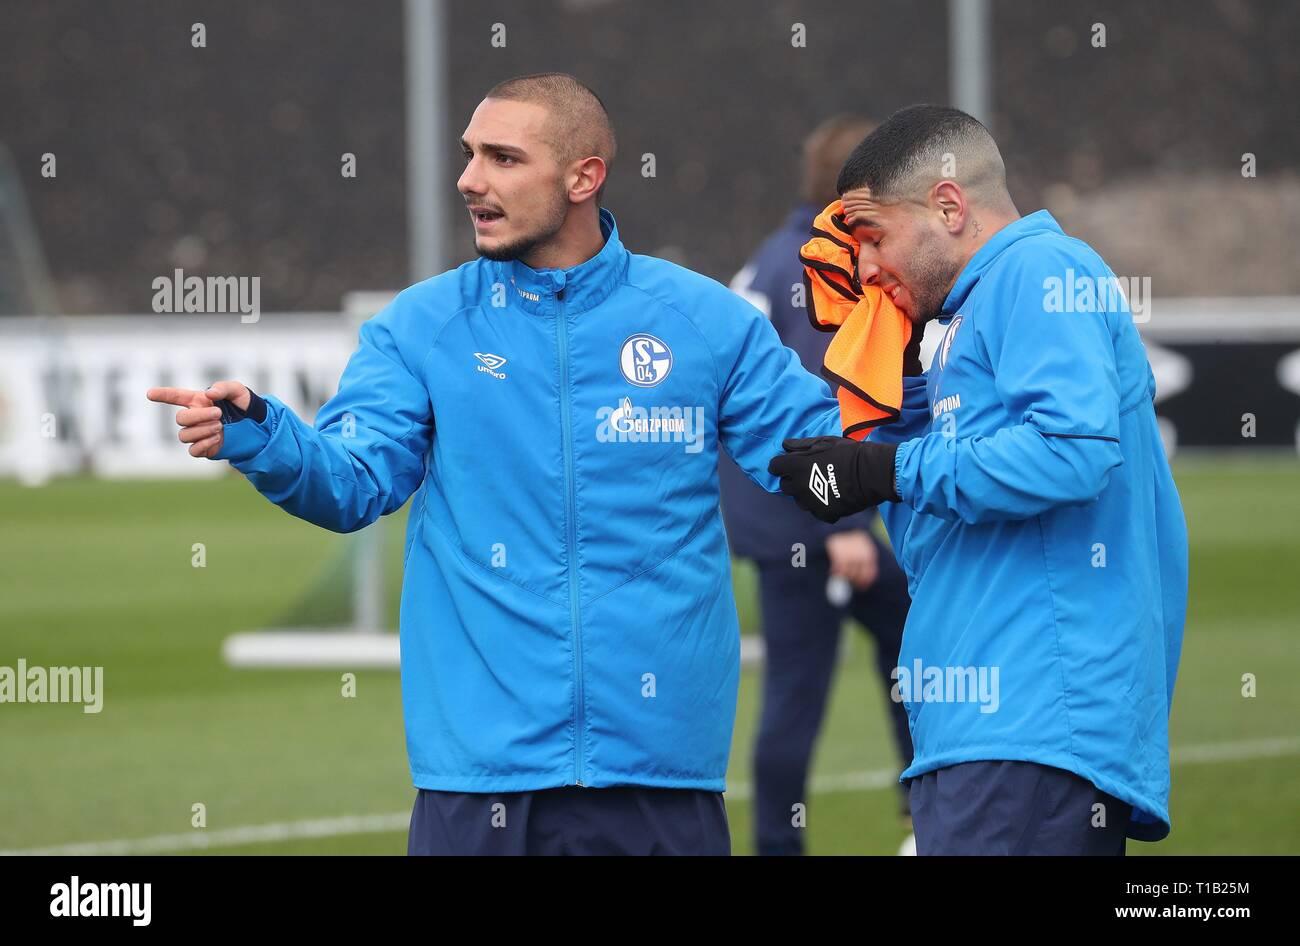 firo: 25.03.2019, Football, 2018/2019, 1.Bundesliga: FC Schalke 04 - Training gesture Ahmed Kutucu and Omar Mascarell   usage worldwide - Stock Image